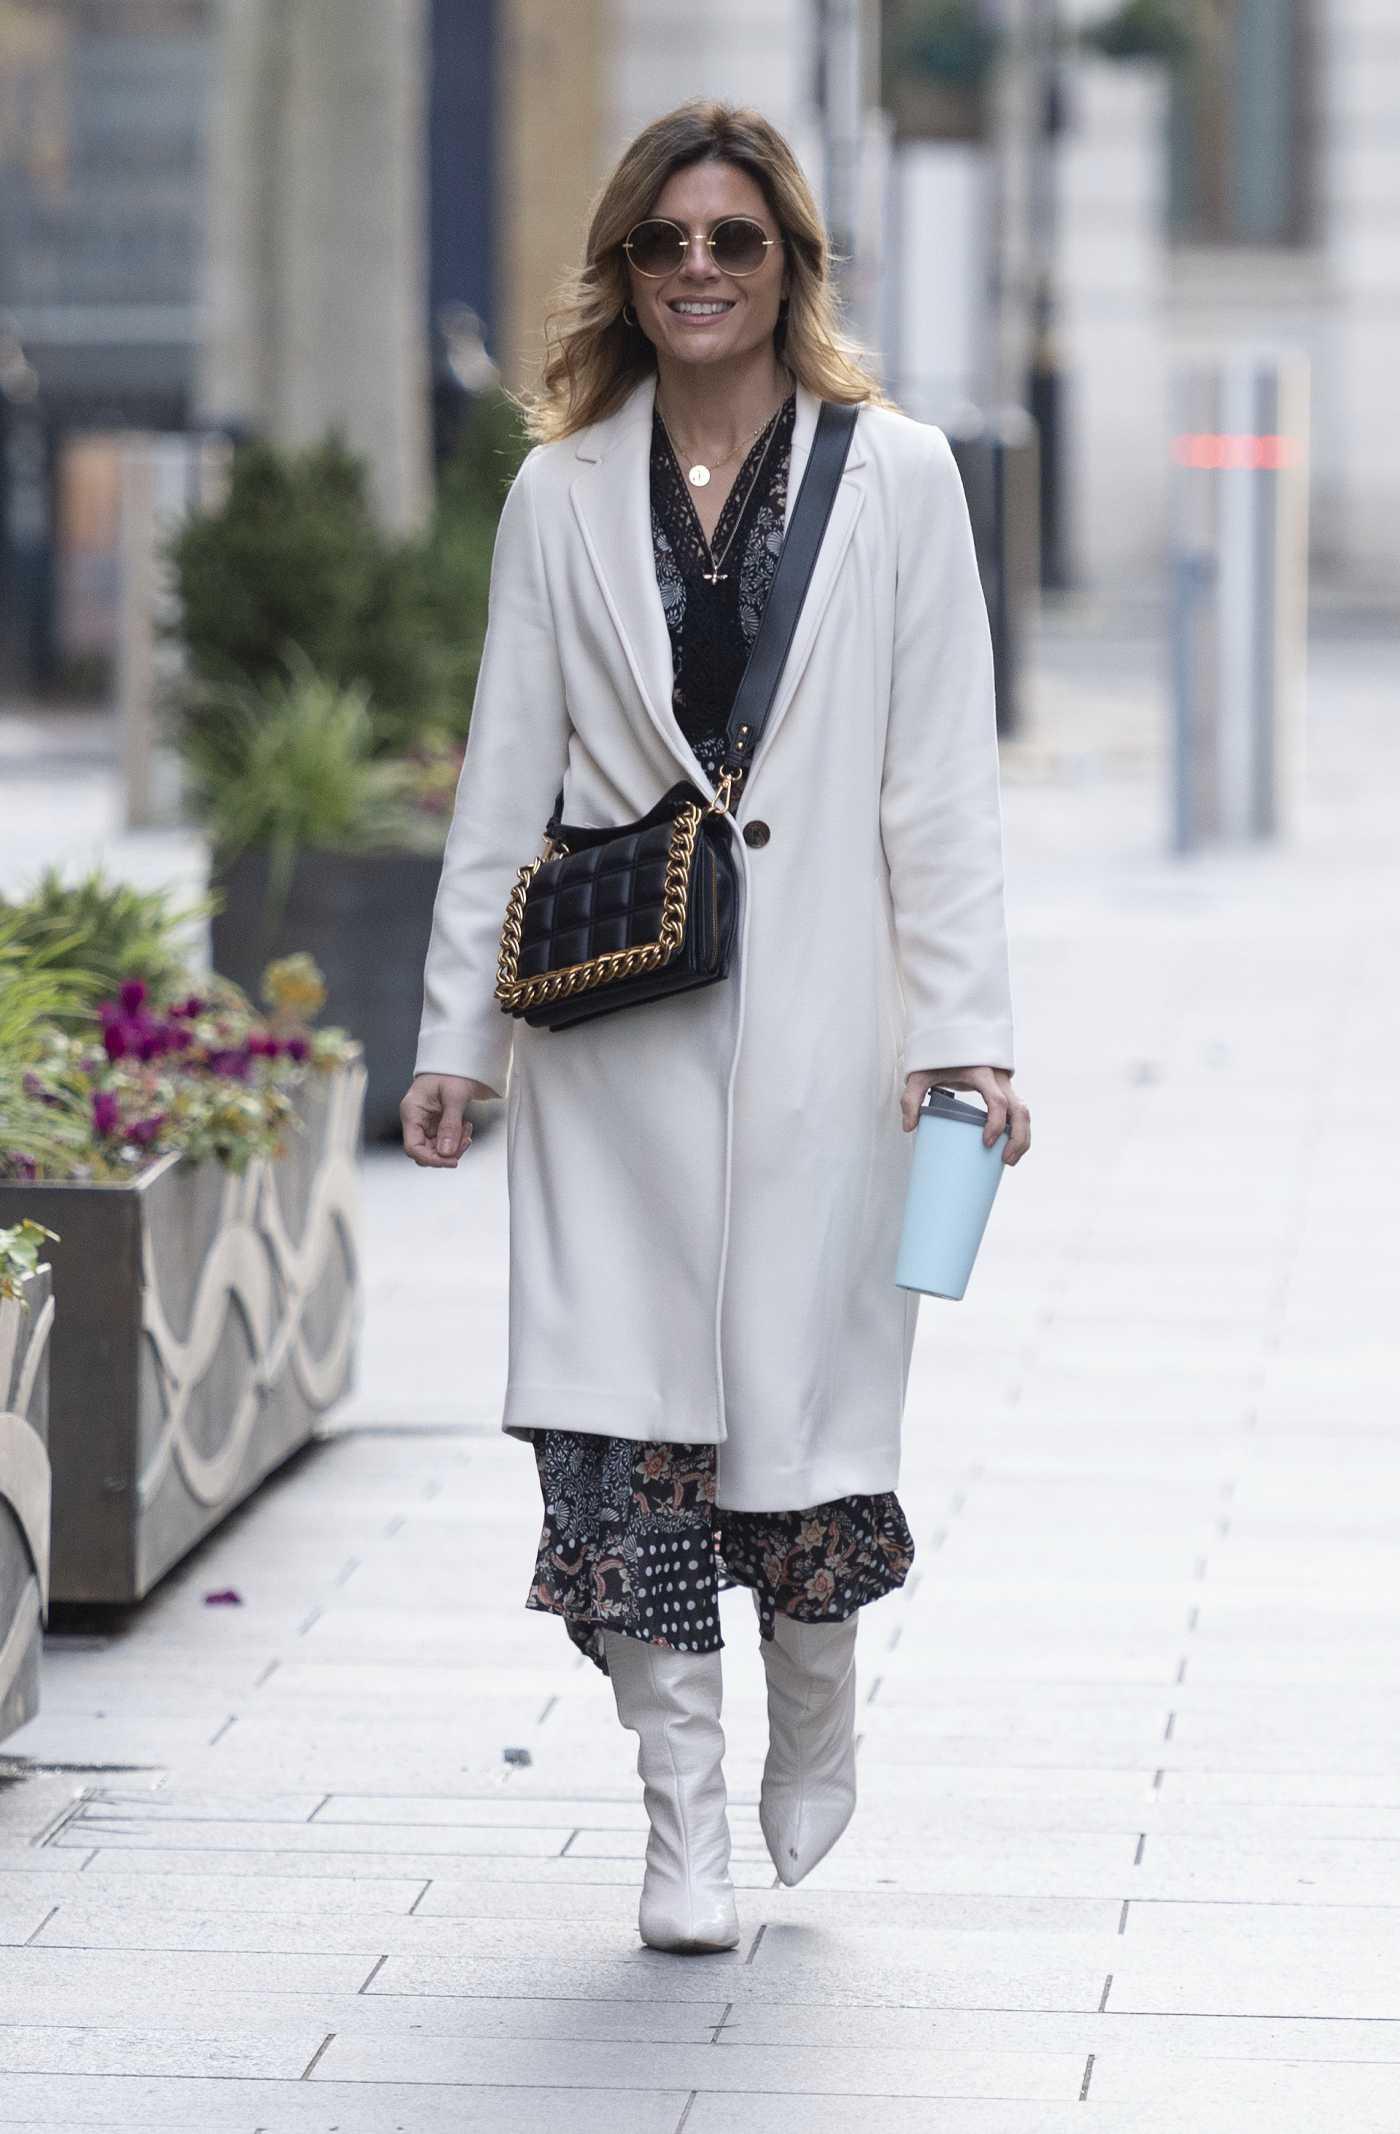 Zoe Hardman in a White Coat Arrives at the Global Radio Studios in London 01/31/2021